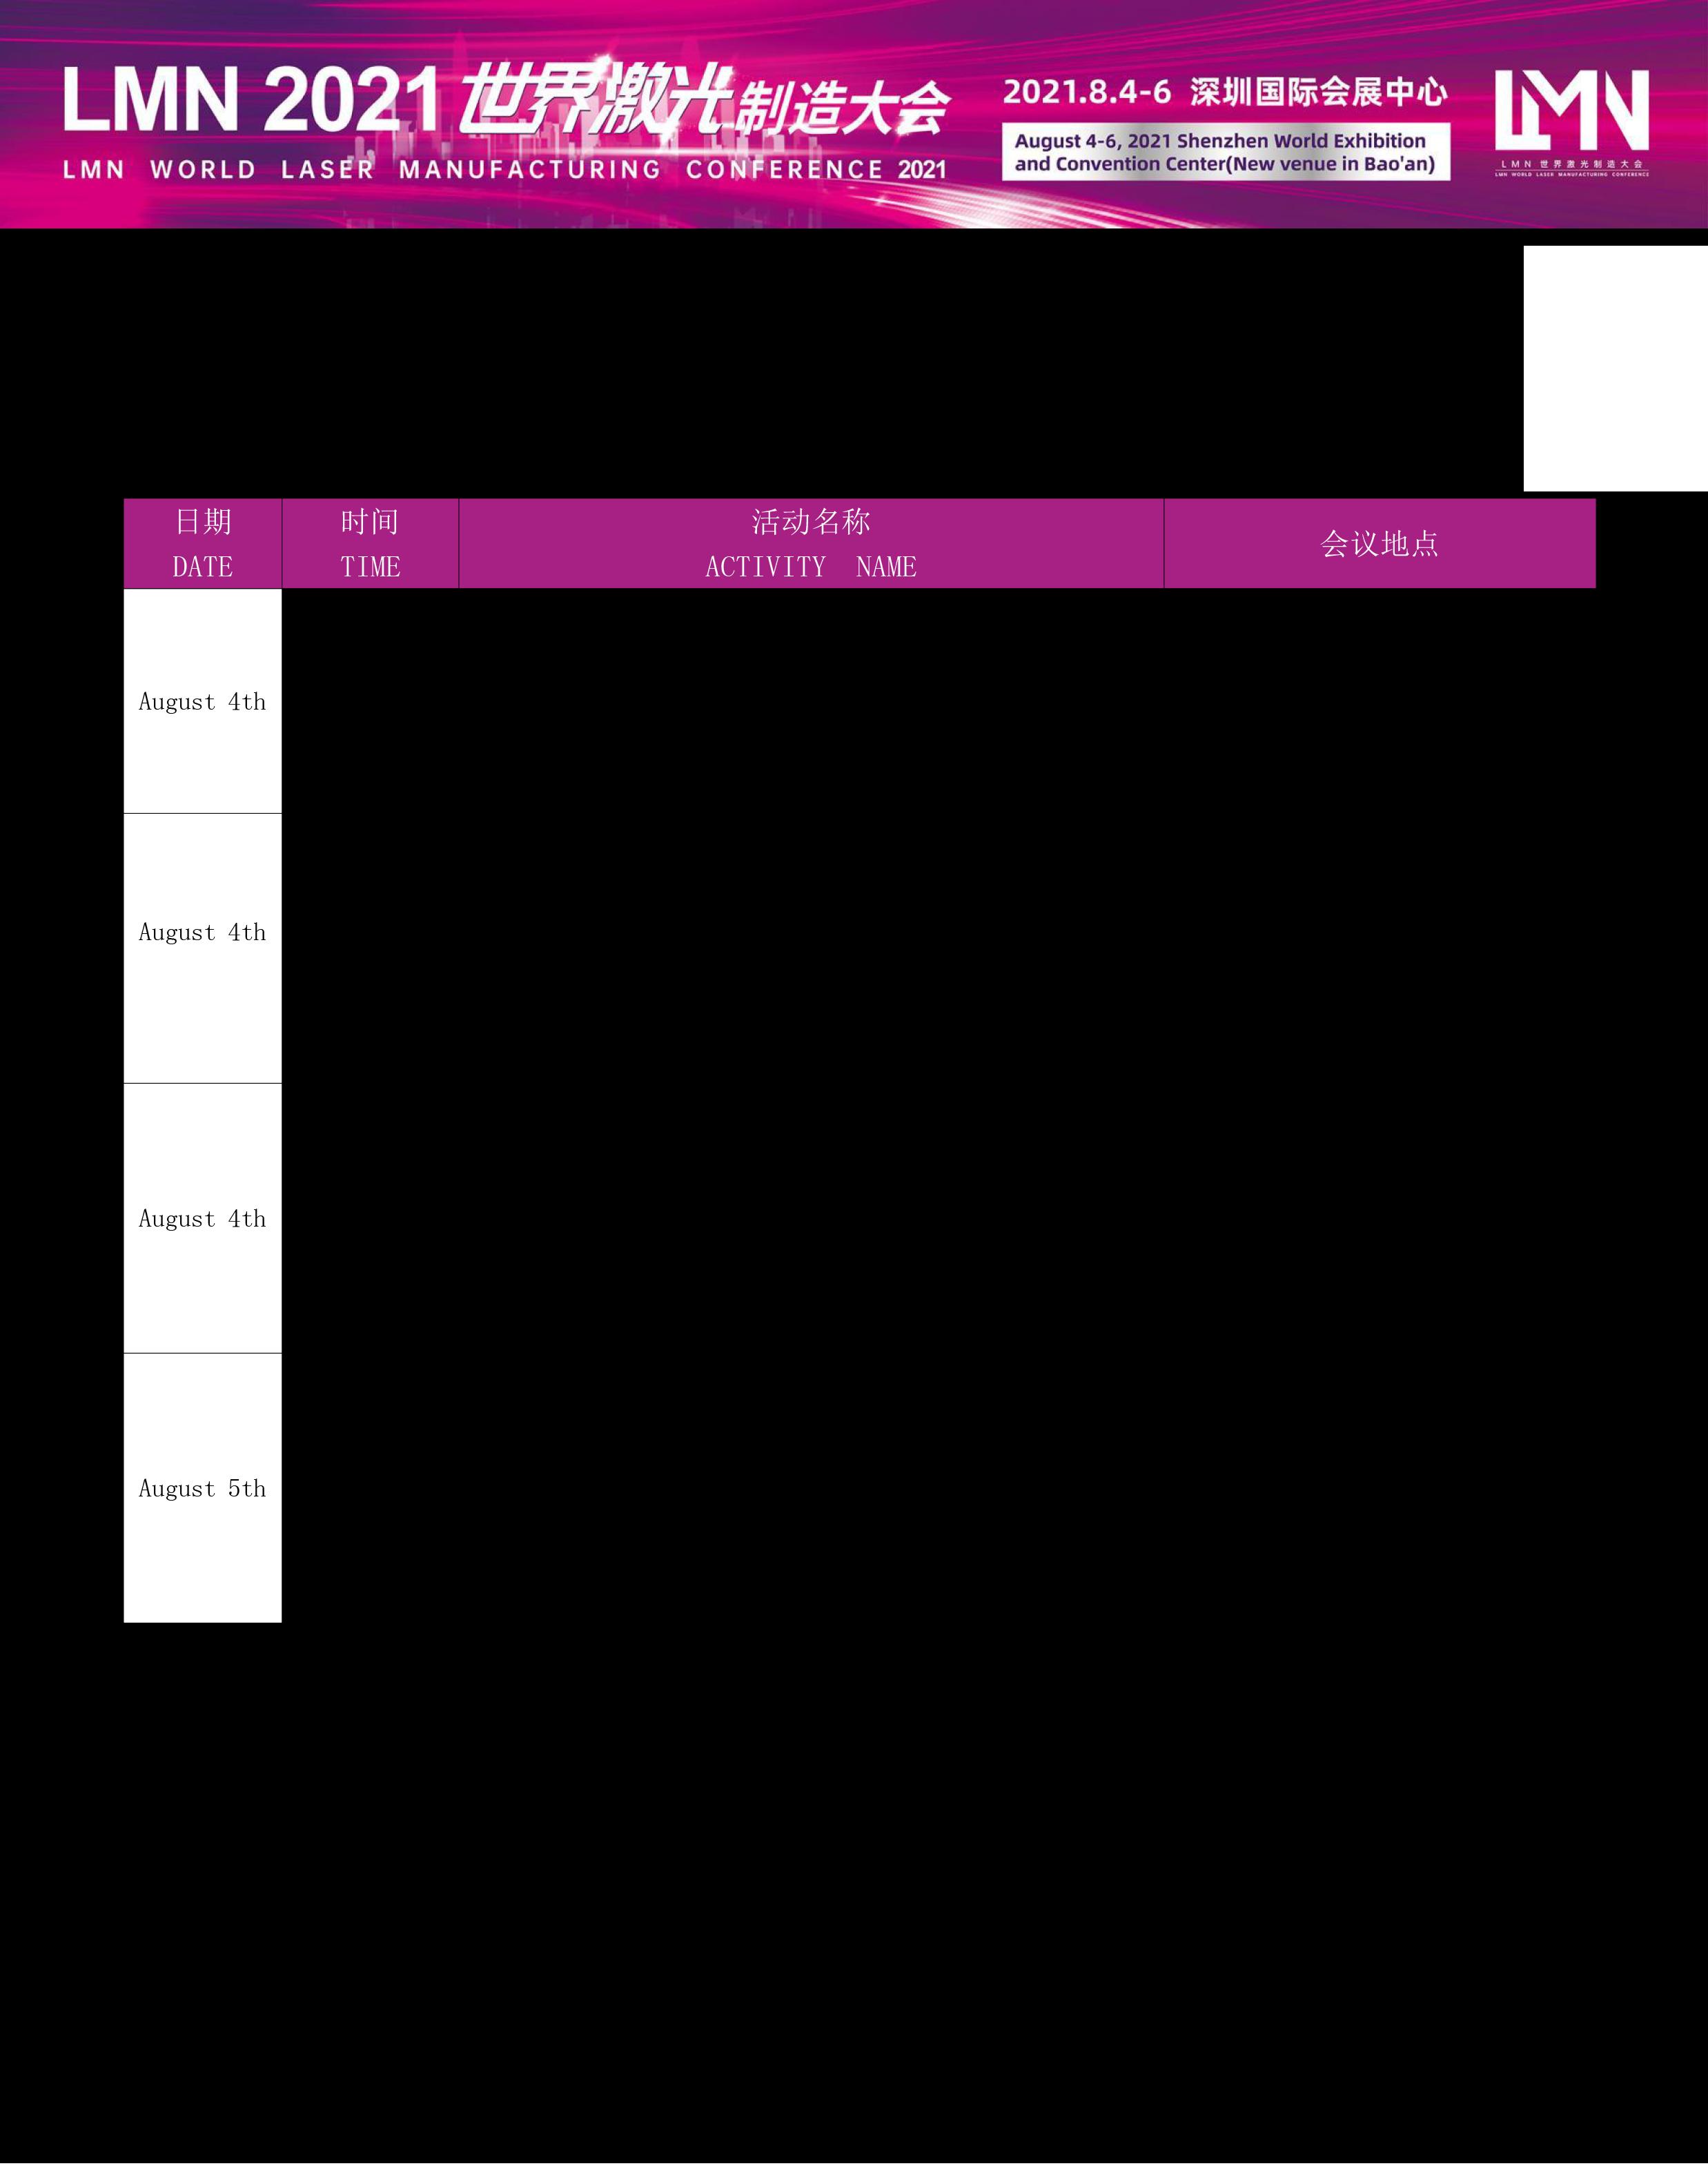 LMN 2021 世界激光制造大会 日程安排表(1).png